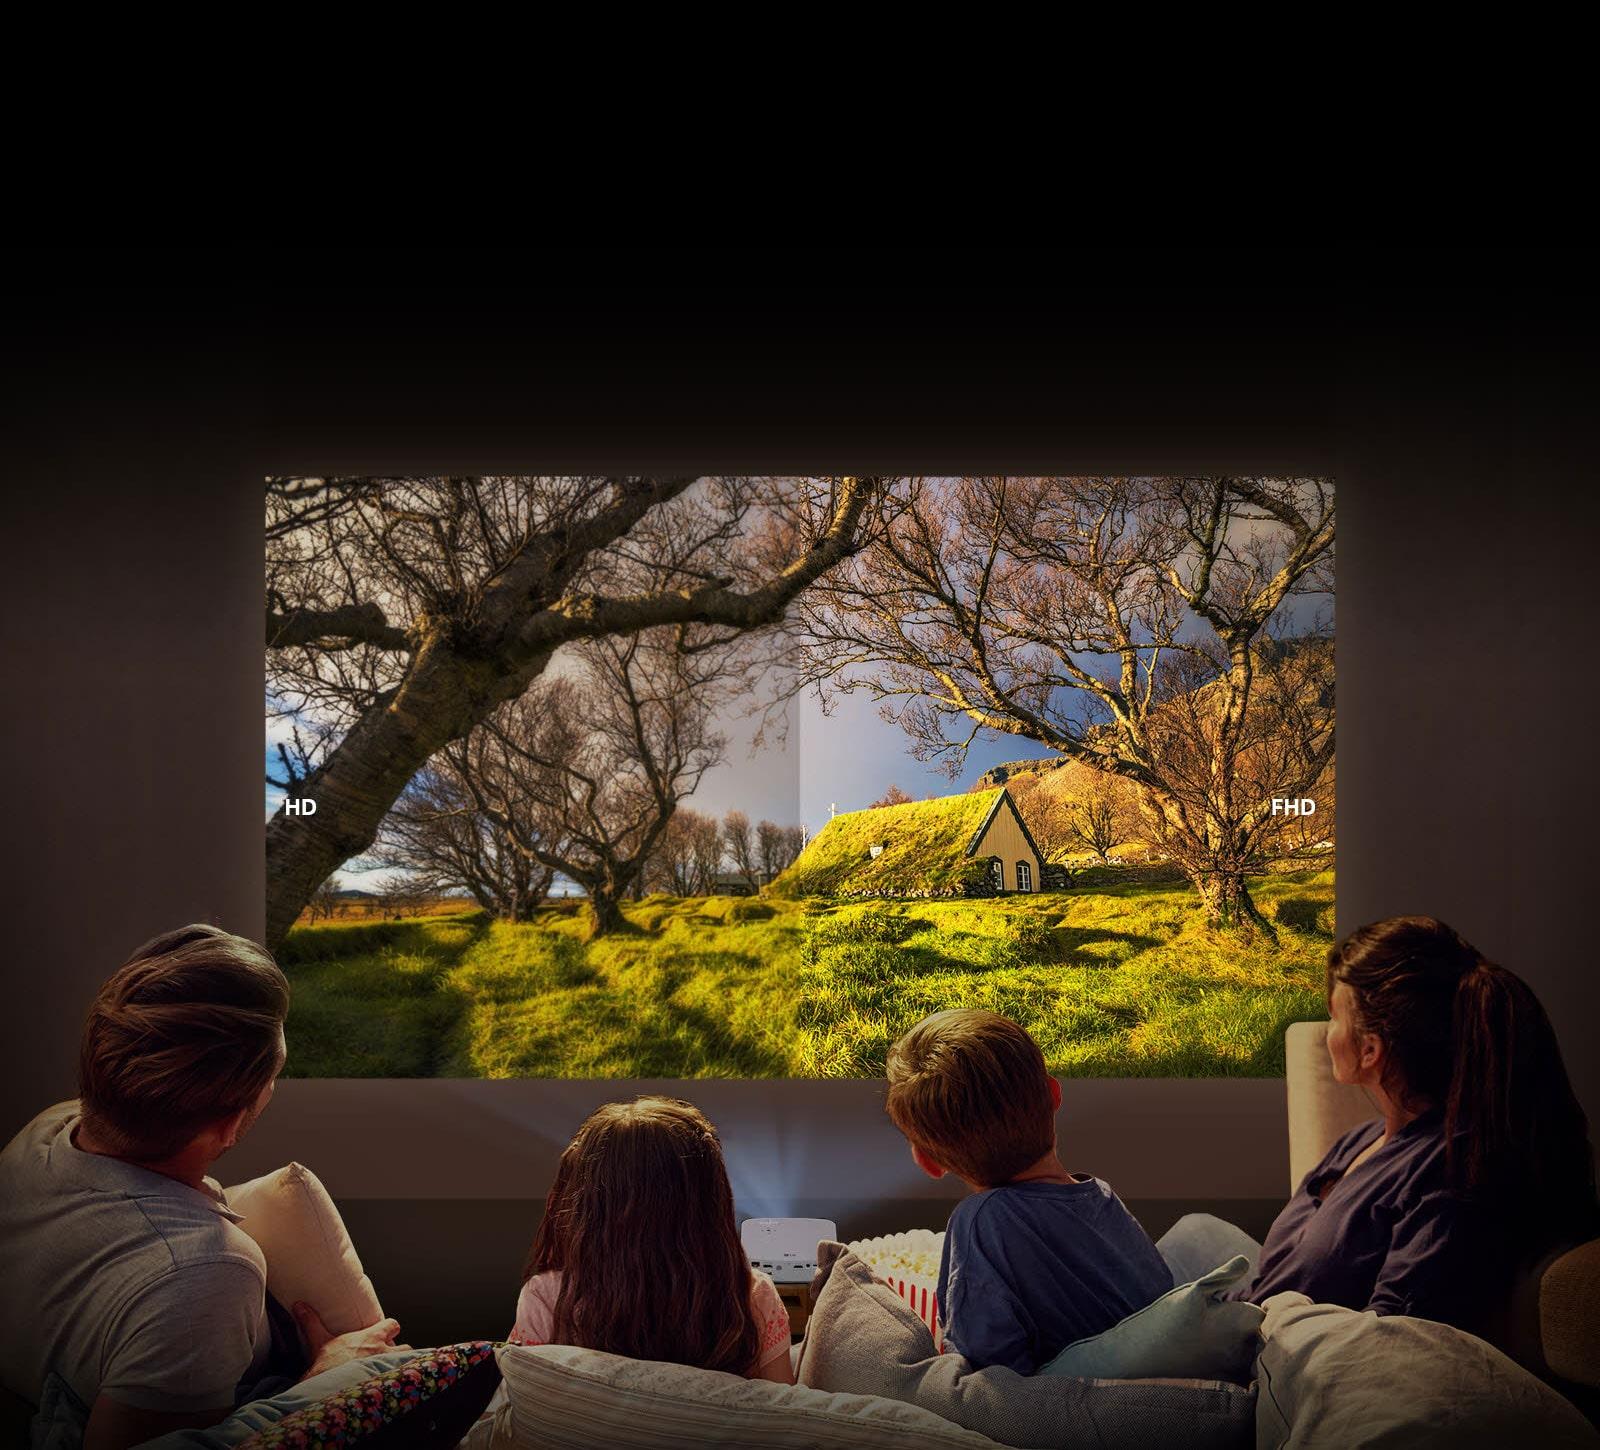 Doživite nevjerojatnu Full HD razlučivost1